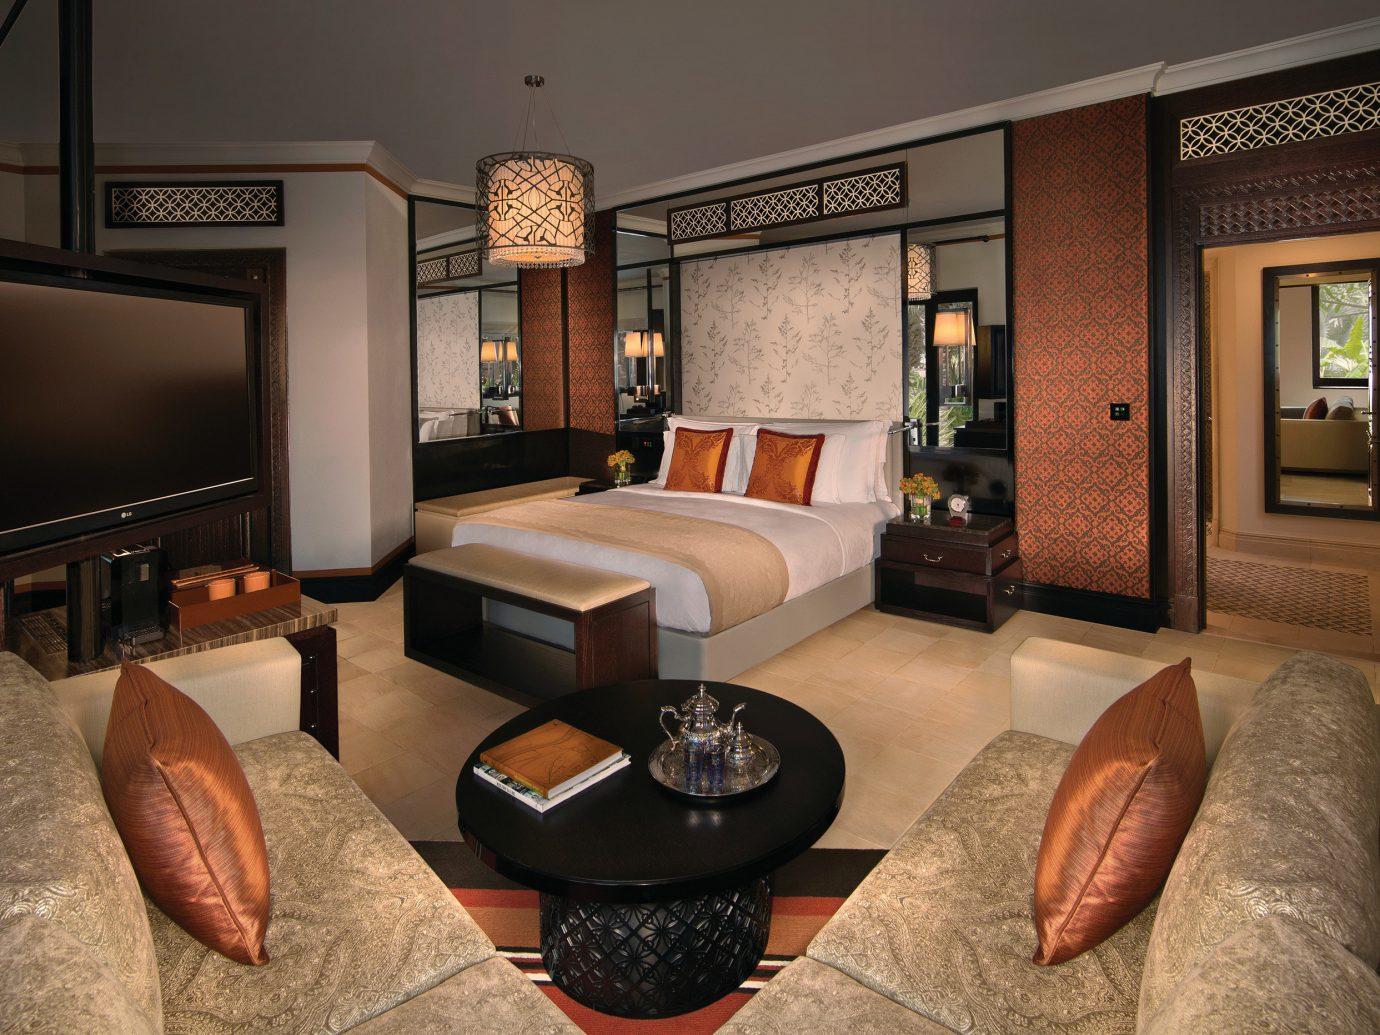 Dubai Hotels Luxury Travel Middle East indoor Living room sofa floor interior design furniture living room Suite hotel interior designer decorated flat Modern